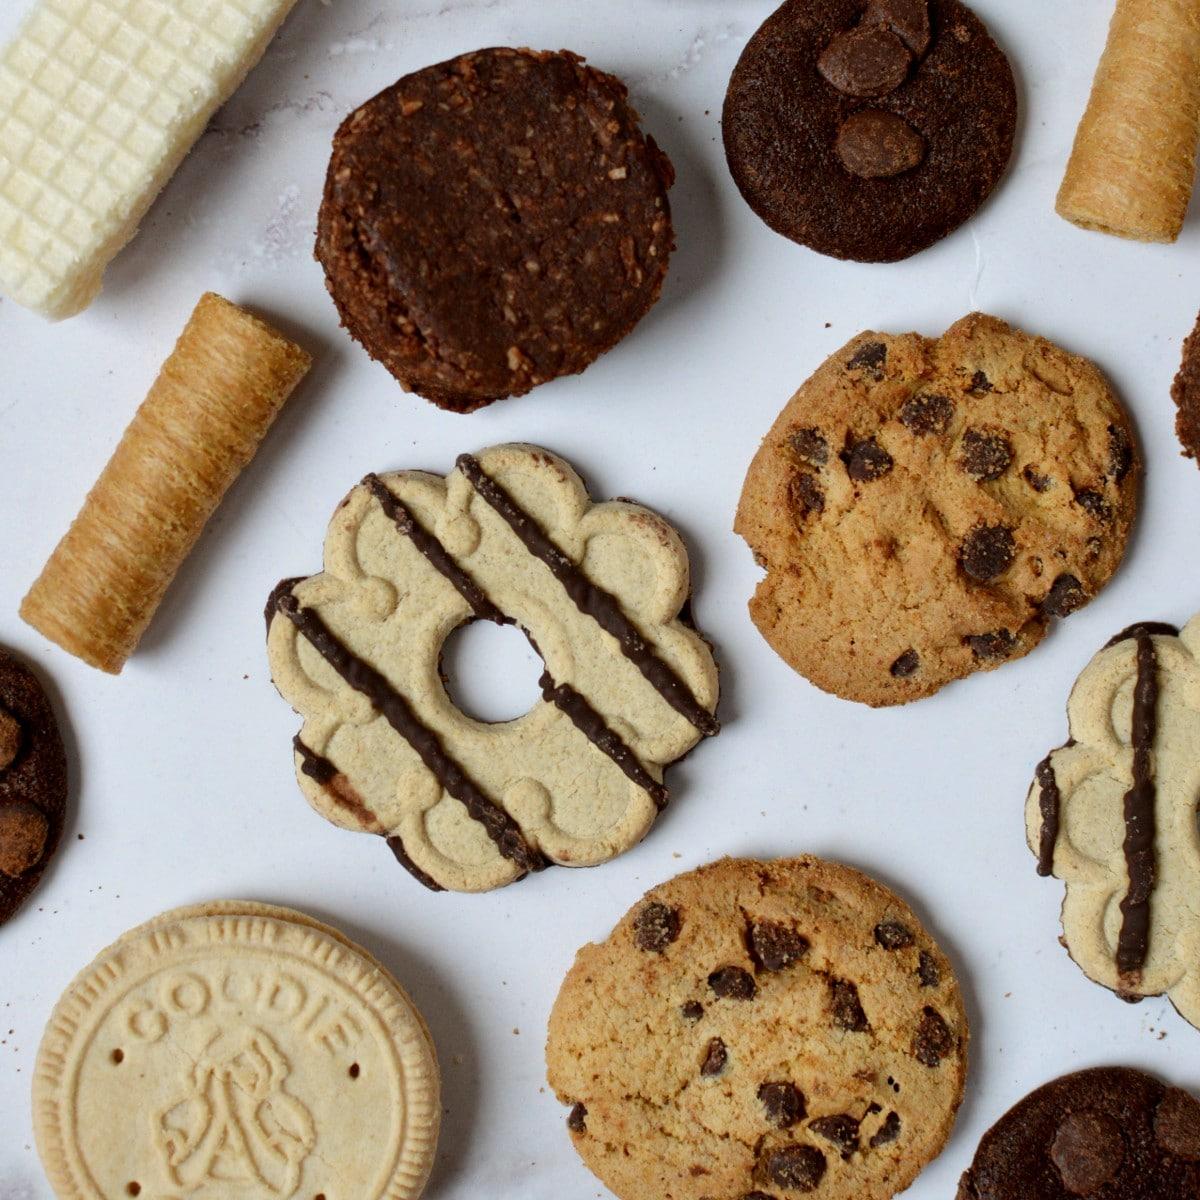 storebought gluten free cookies